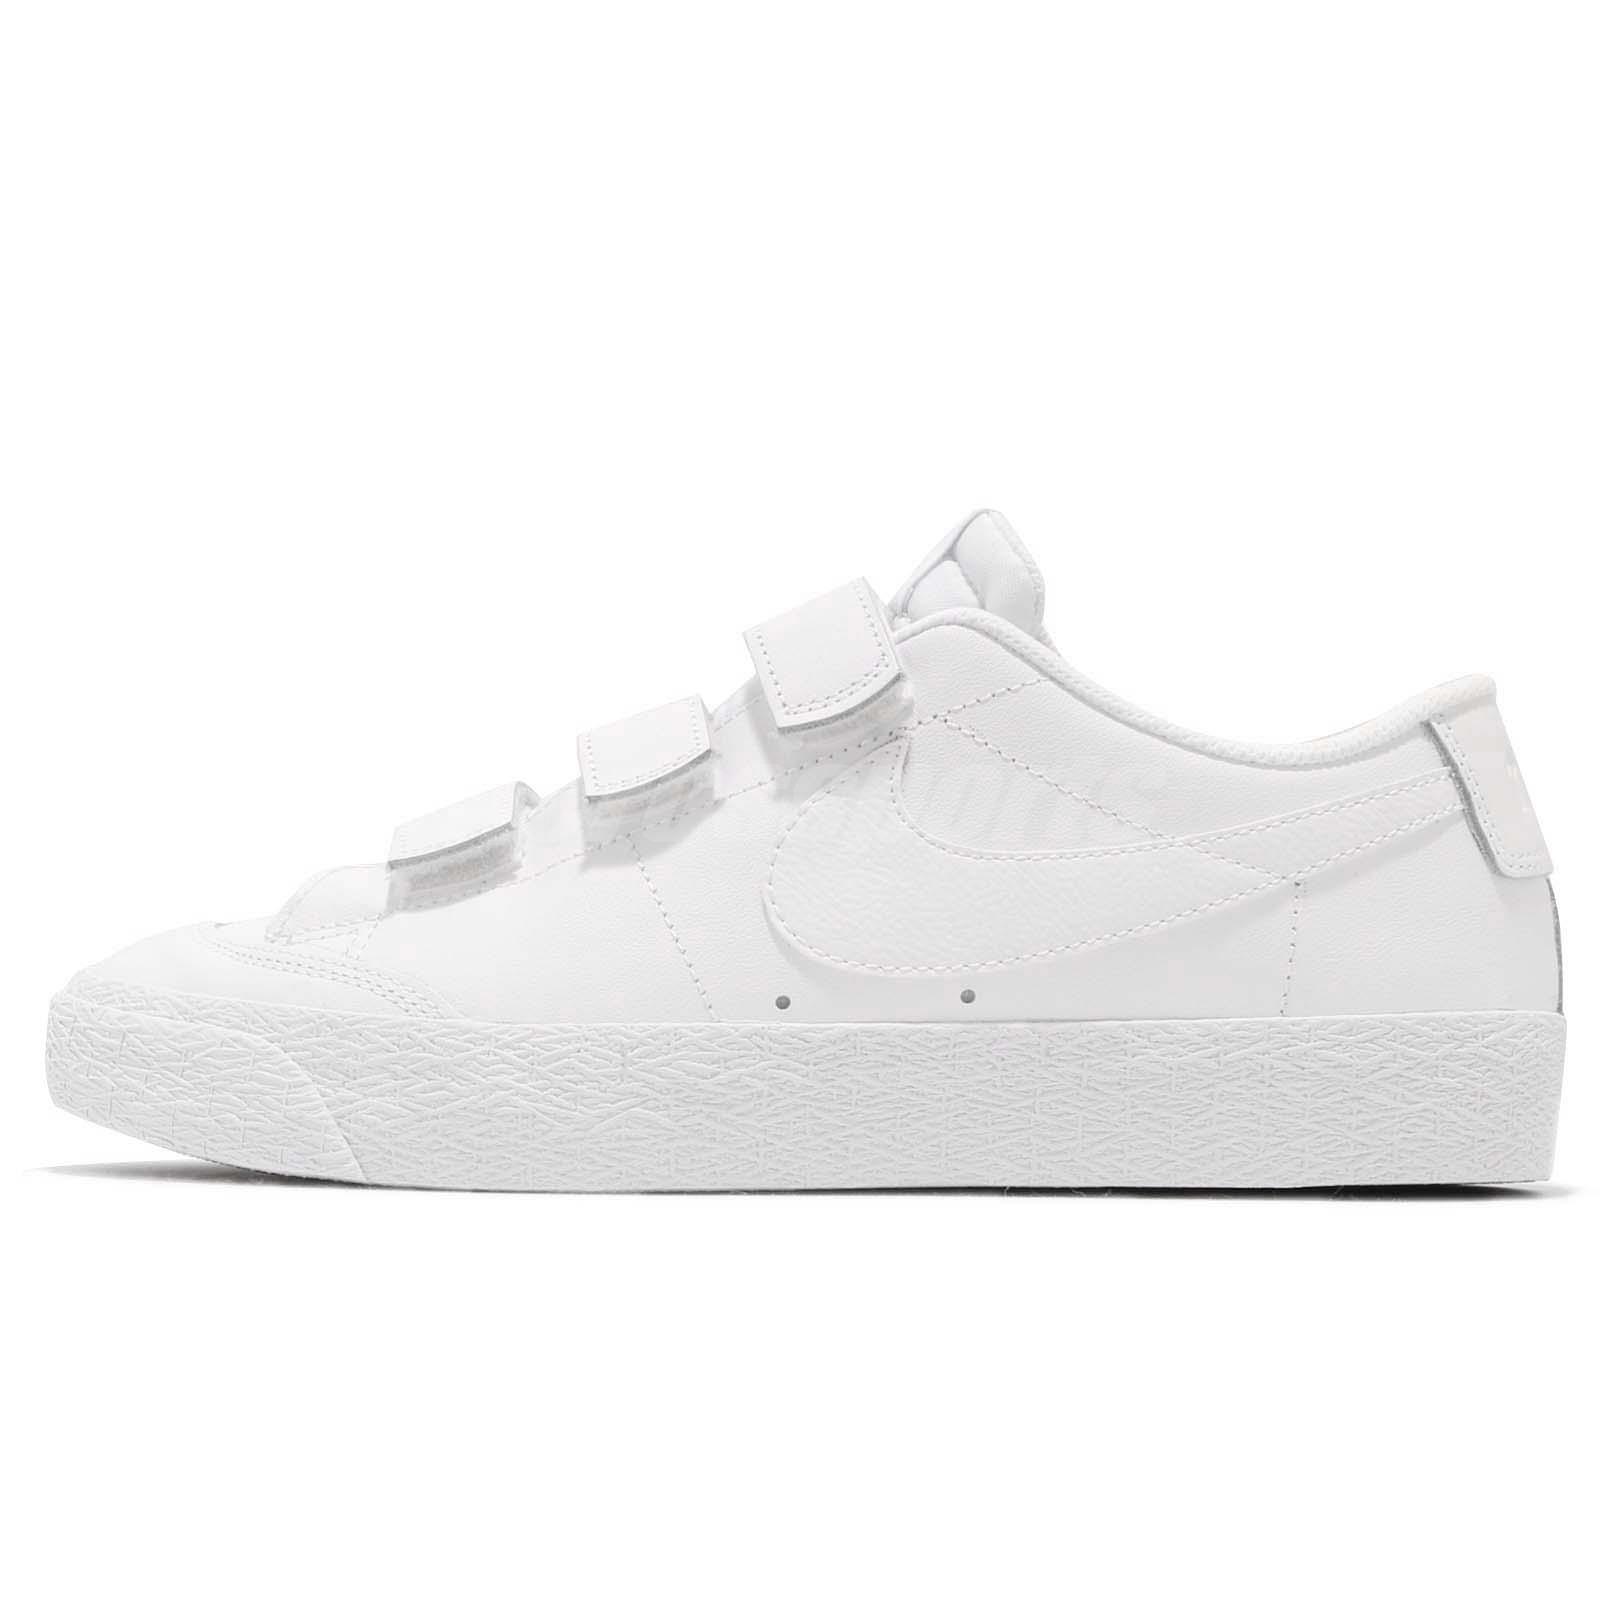 new product 47410 b778c Nike SB Zoom Blazer AC XT White Strap Men Skate Boarding Shoe Sneaker  AH3434-100